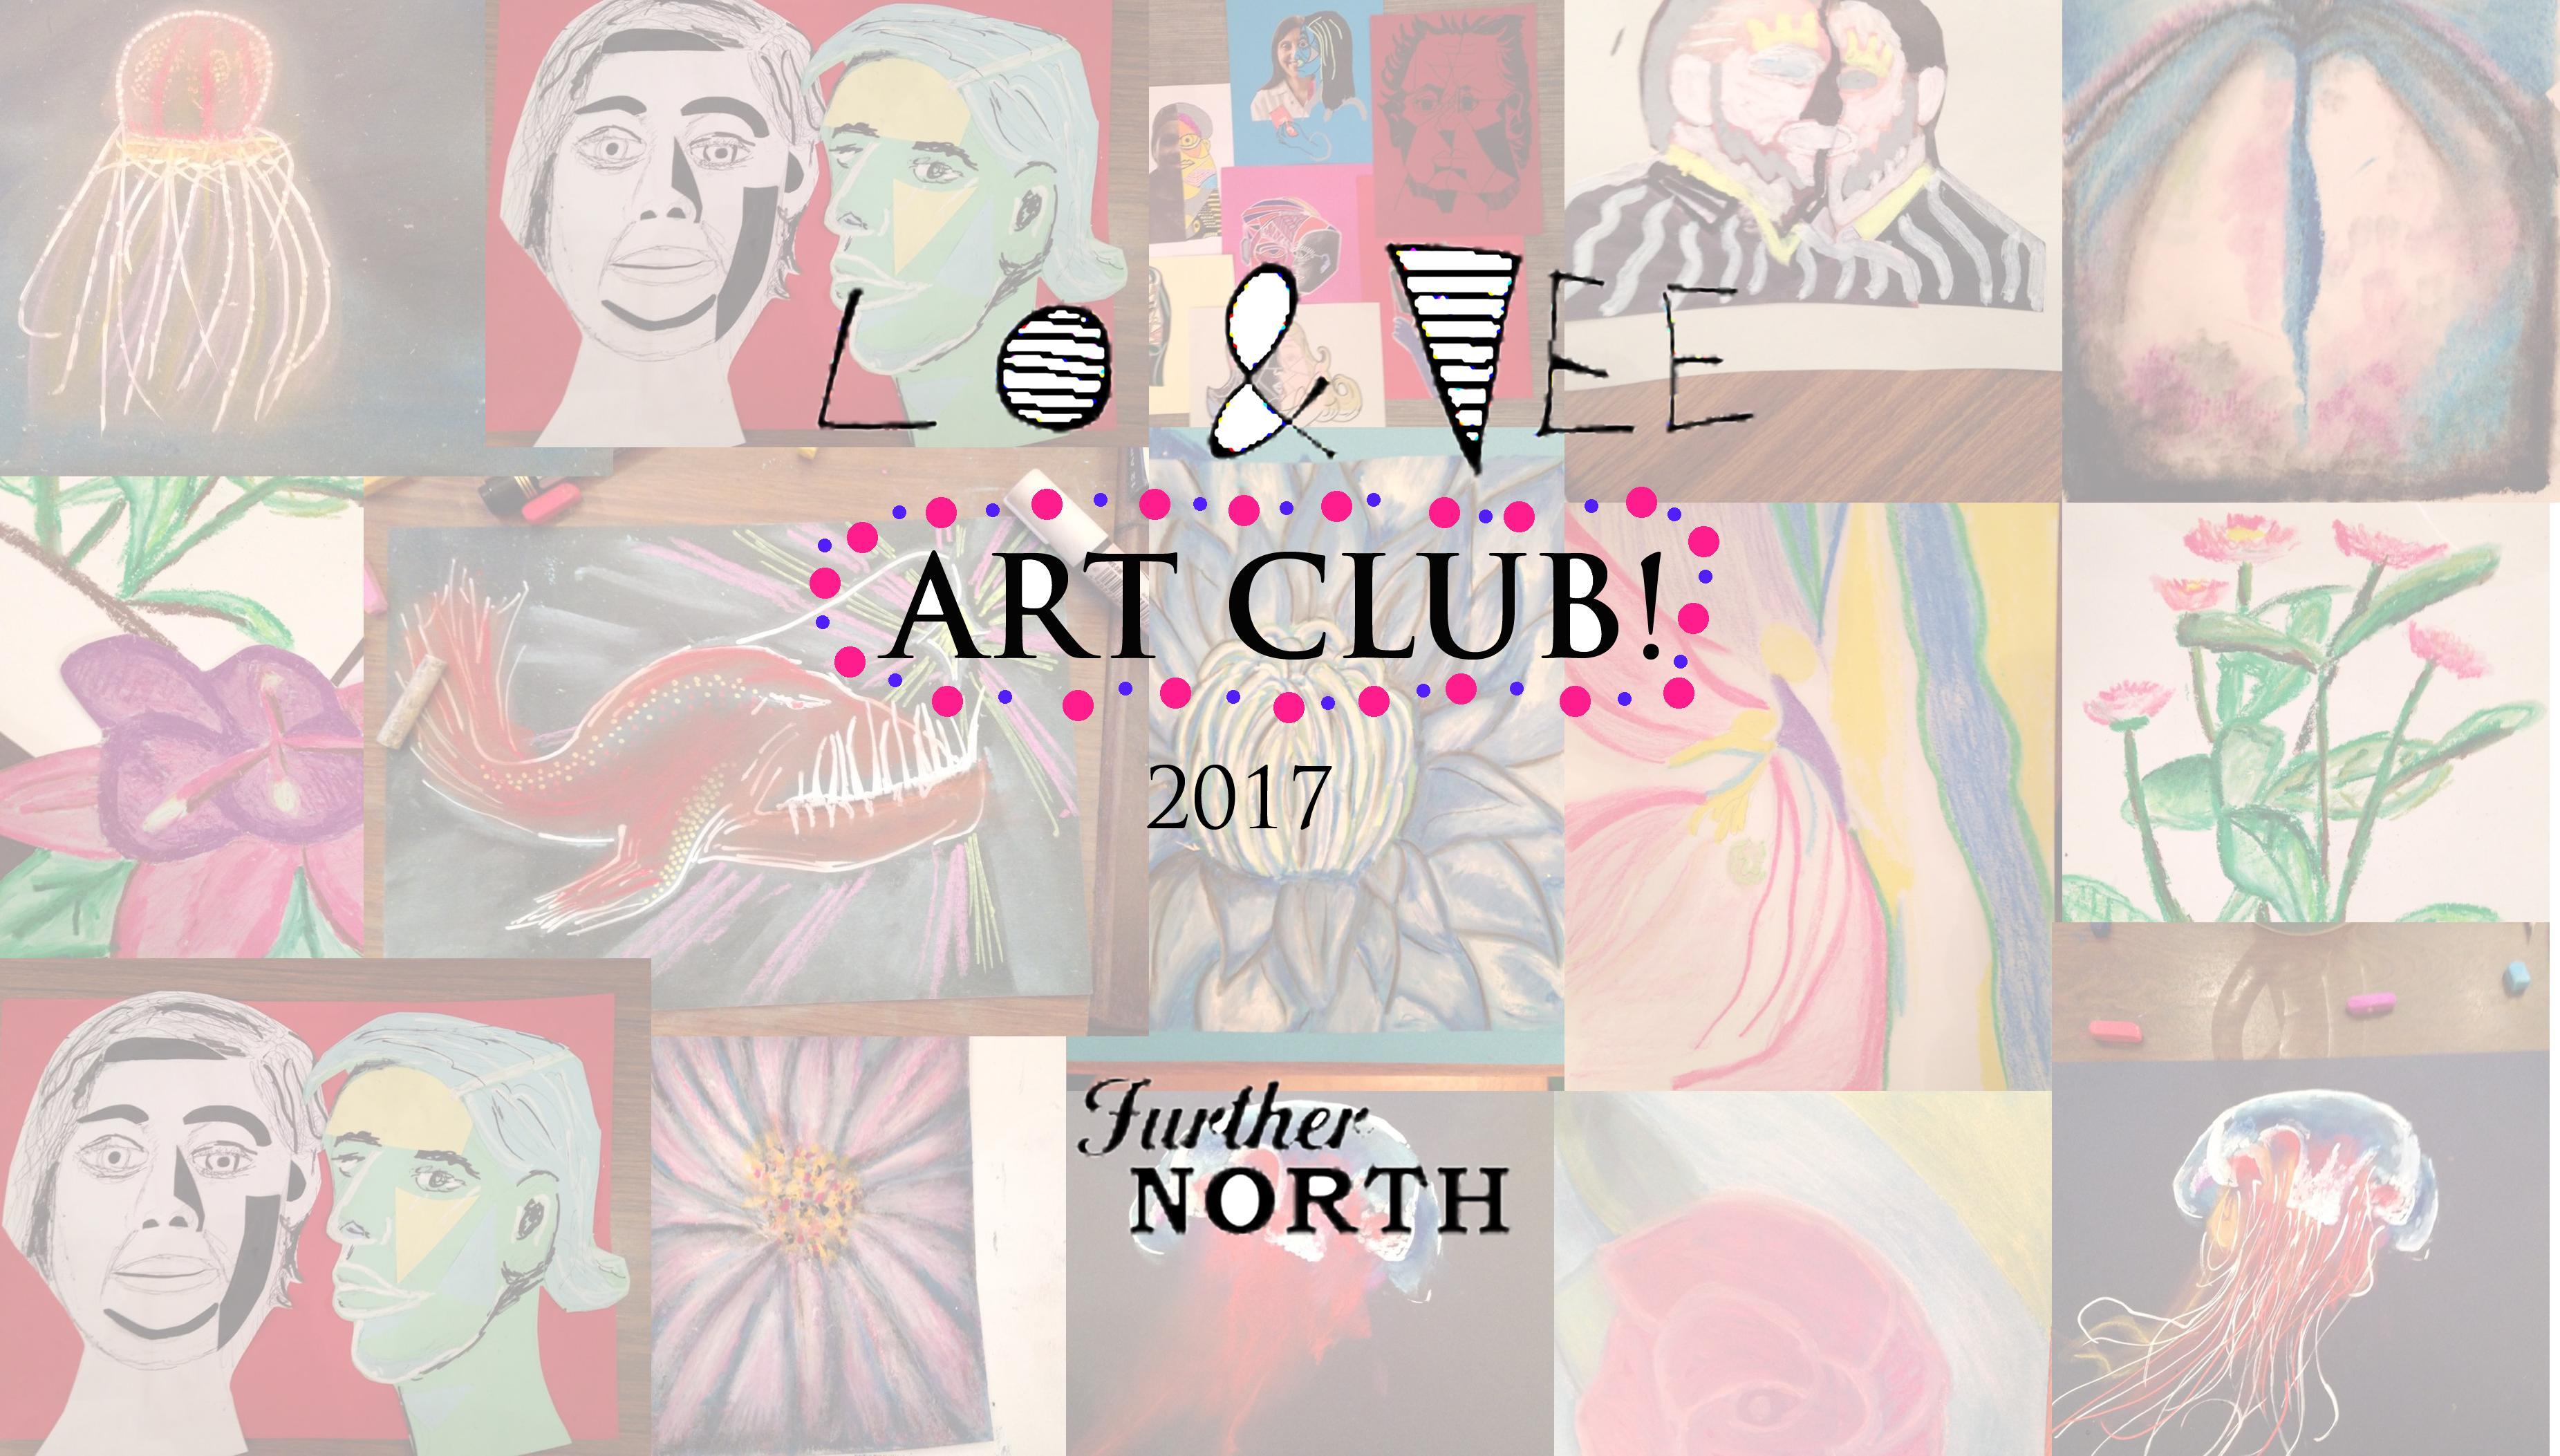 ART CLUB! Workshop By Lo & Vee 25th july